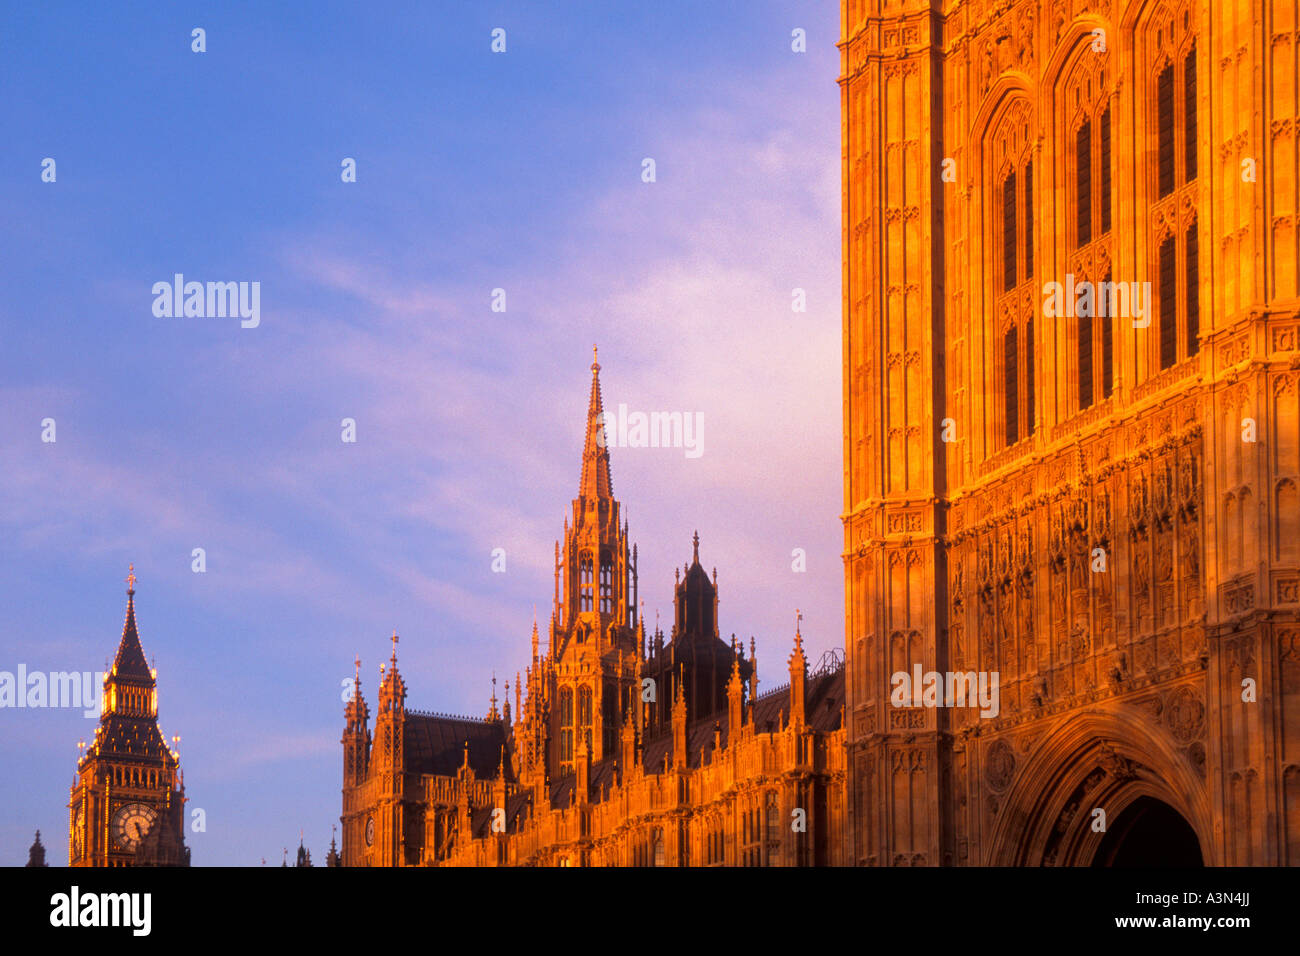 Europe England United Kingdom UK The Houses of Parliament and Big Ben at Dusk Sandra Baker Stock Photo